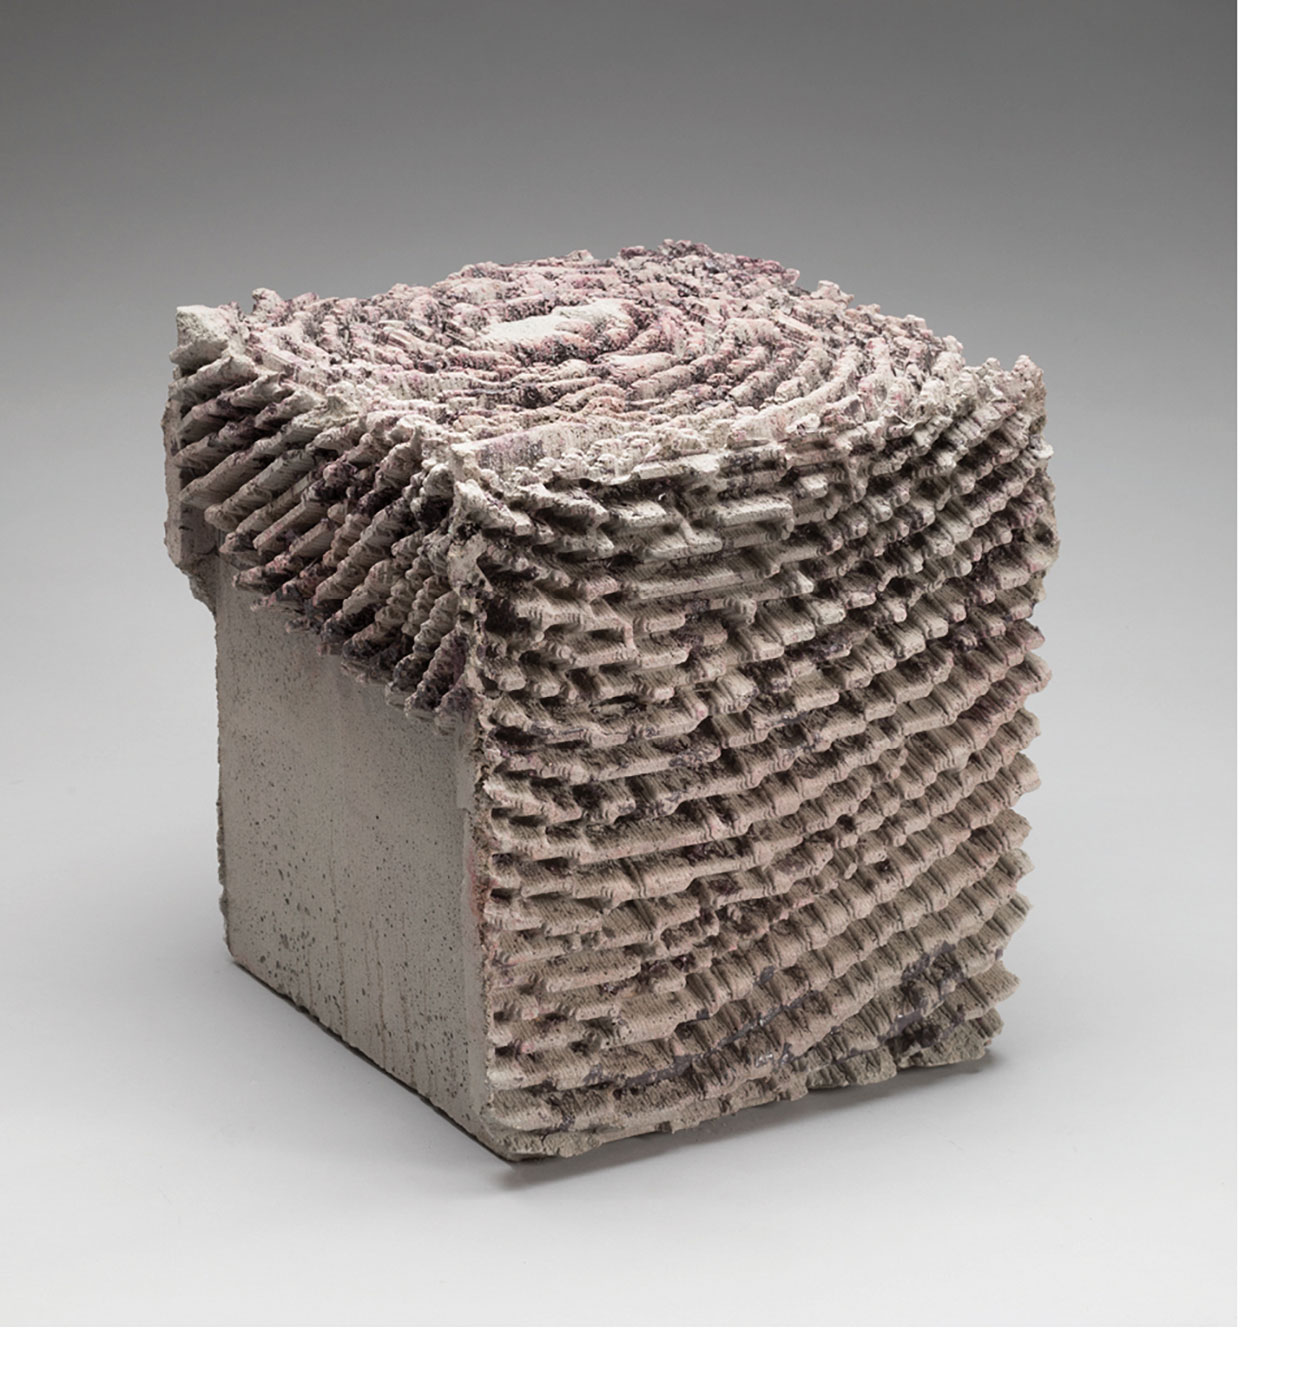 Gjergji Prendi - Cube